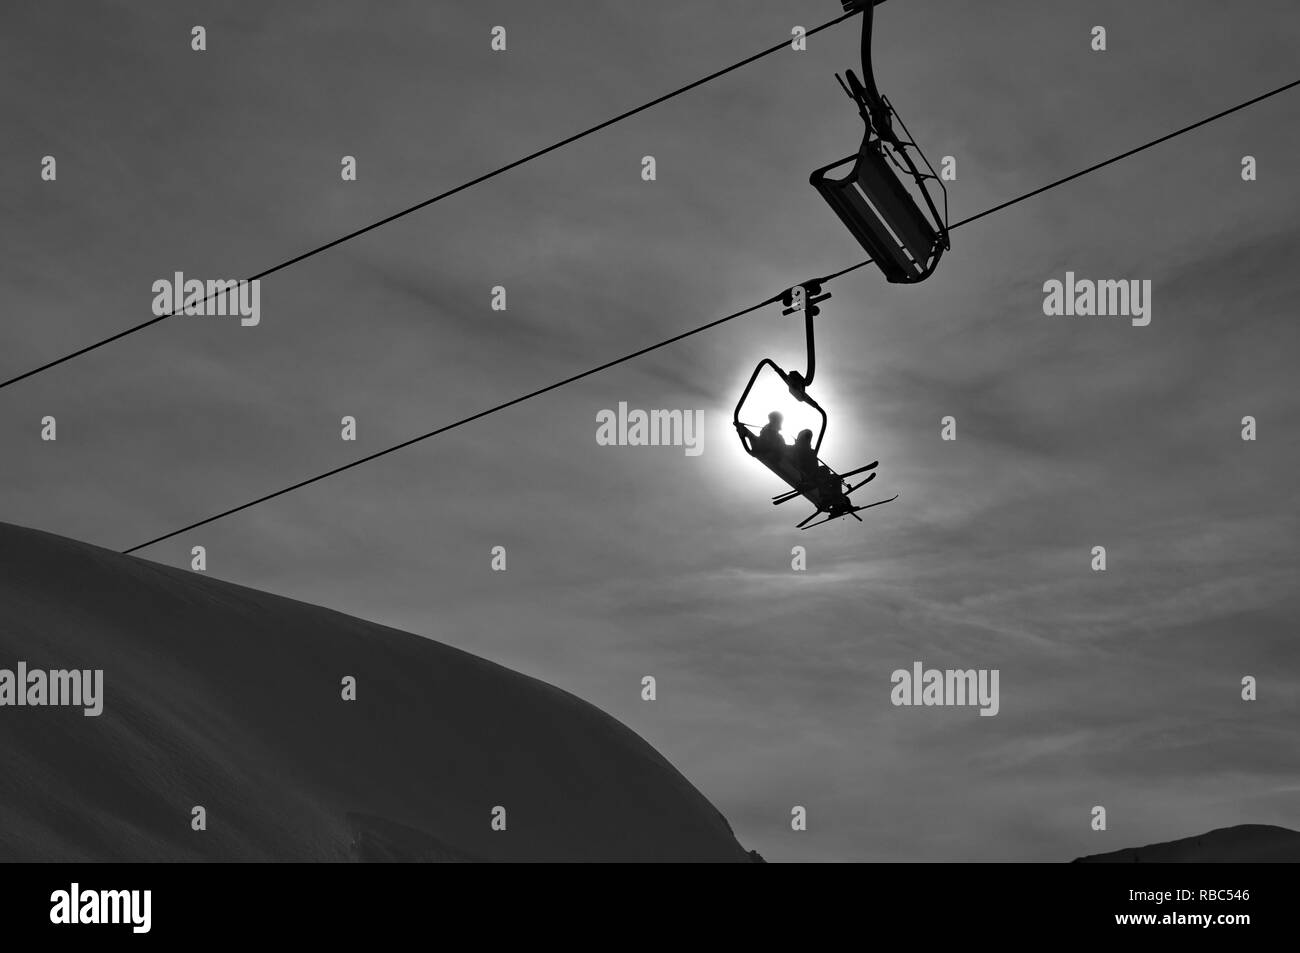 Ski lift silhouette in winter - Stock Image